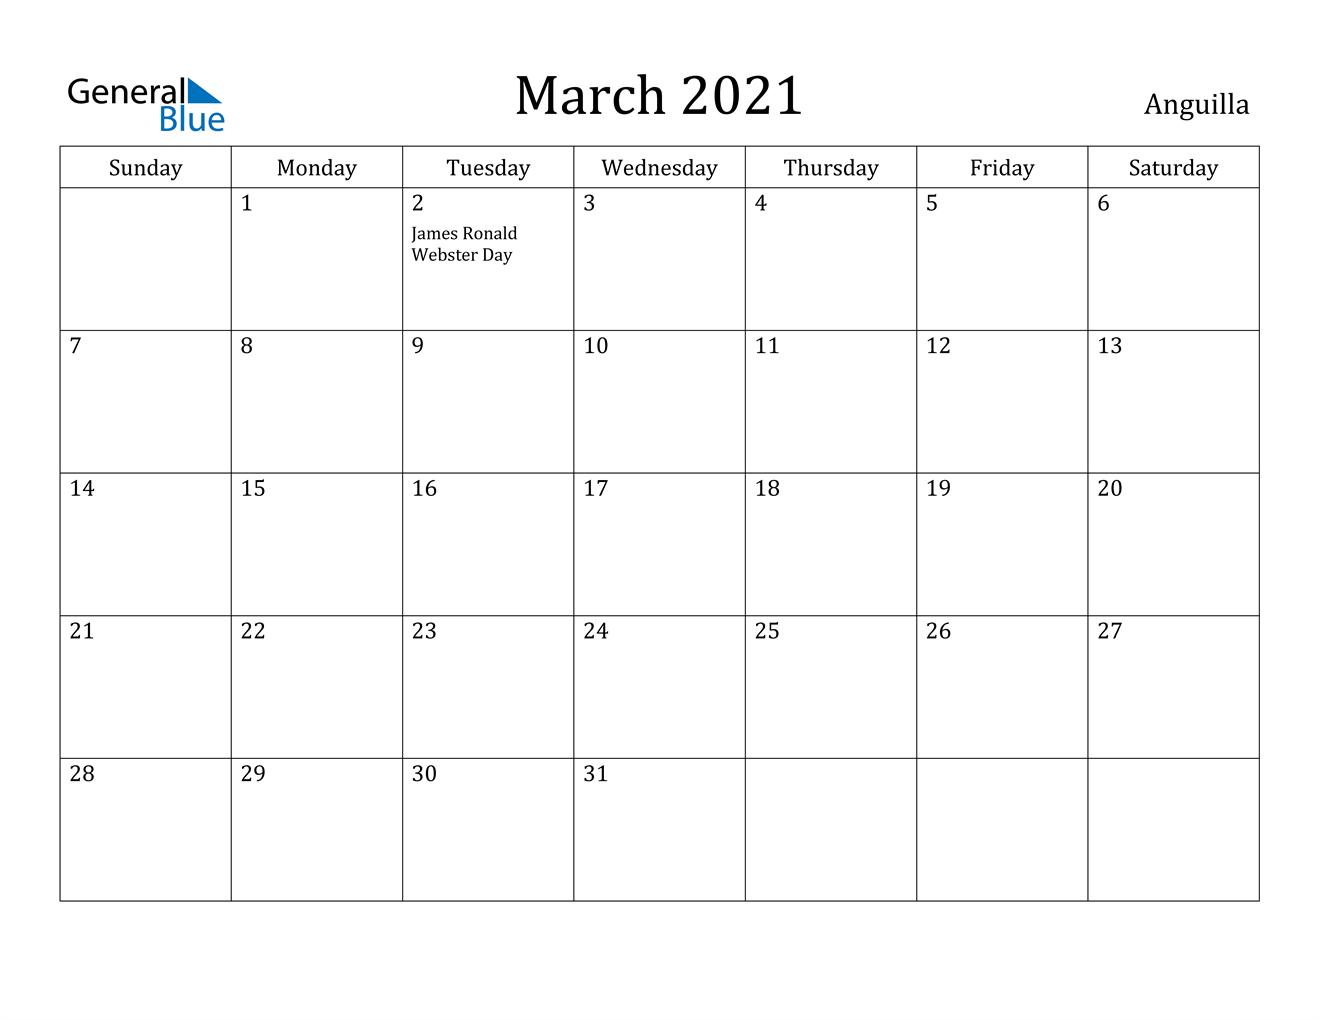 March 2021 Calendar - Anguilla